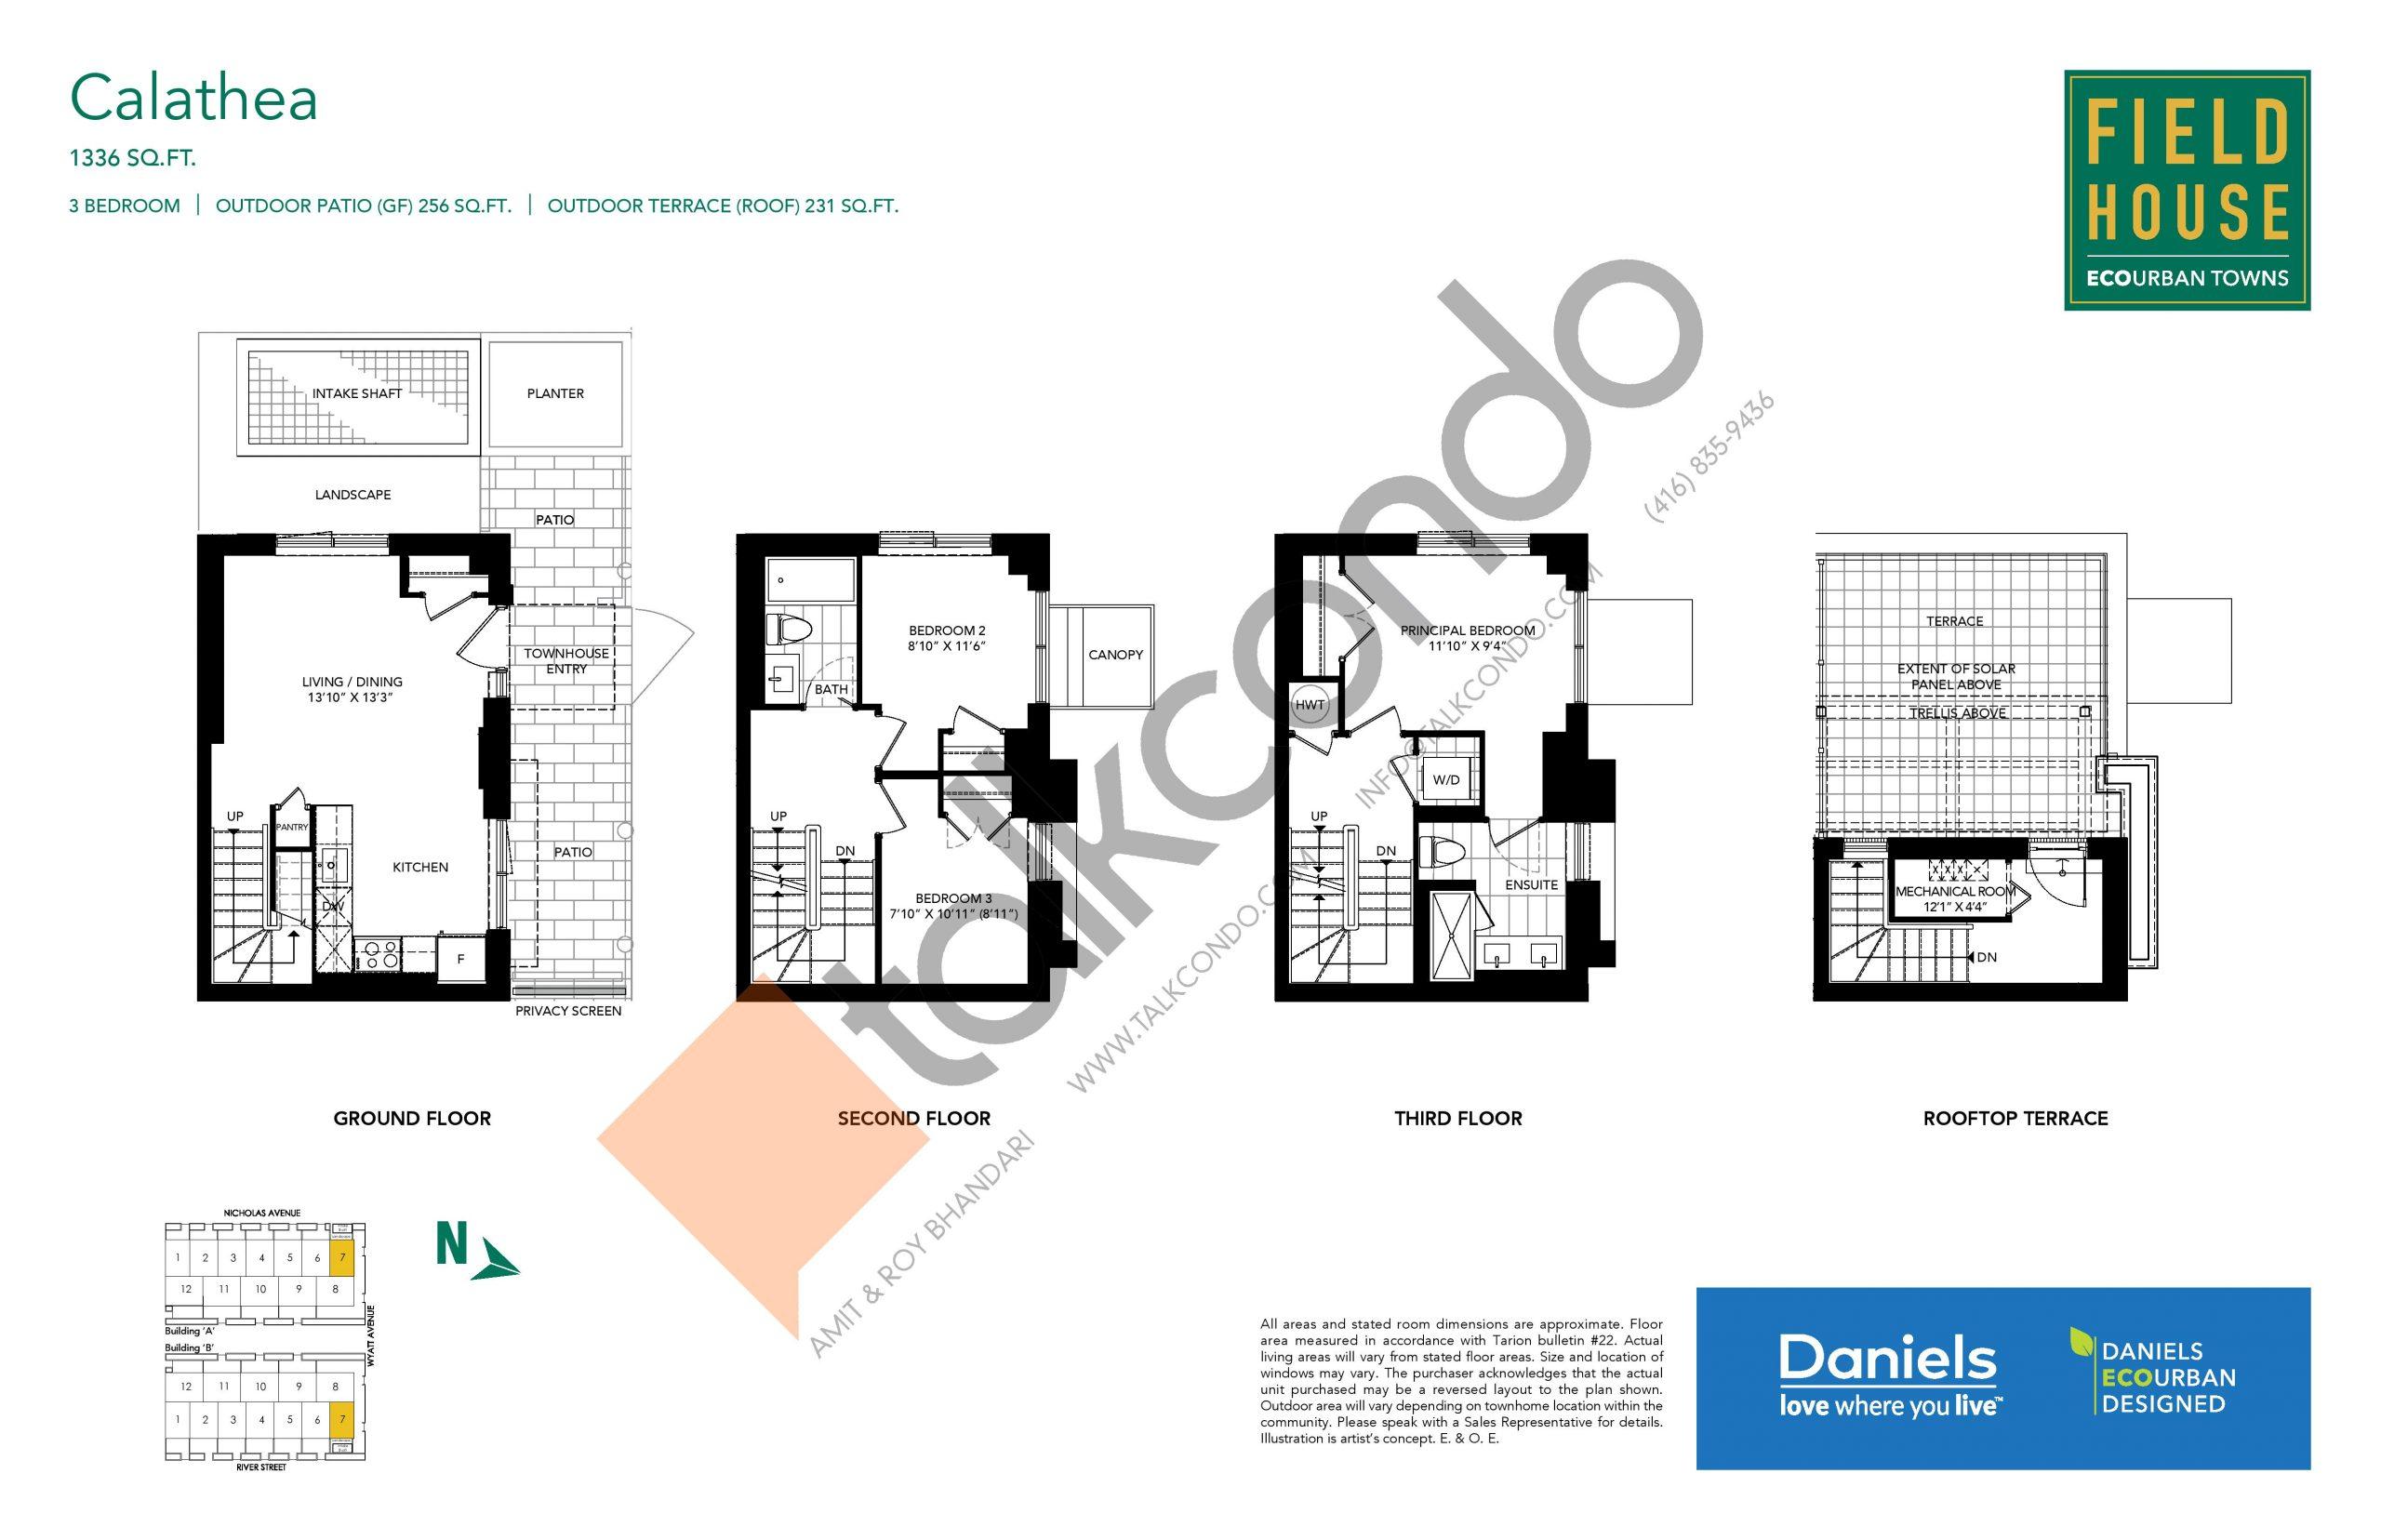 Calathea Floor Plan at Field House Towns - 1336 sq.ft